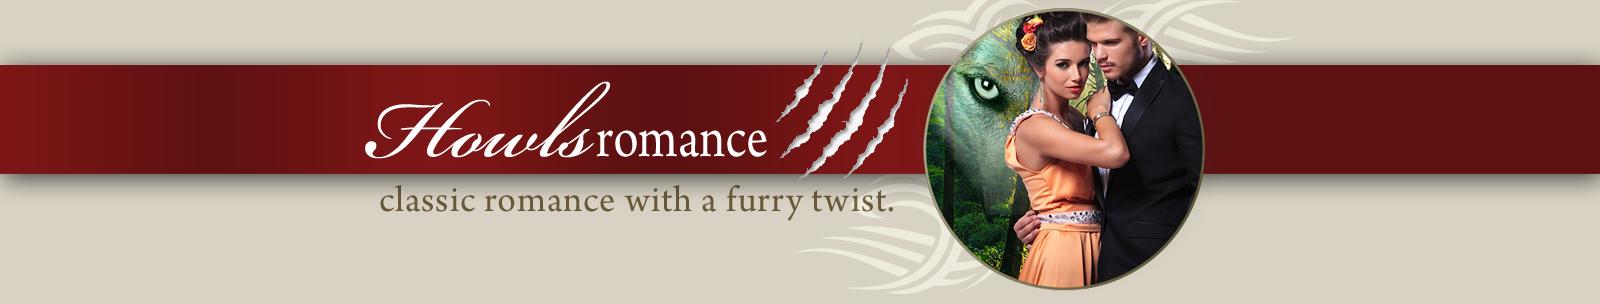 Howls Romance